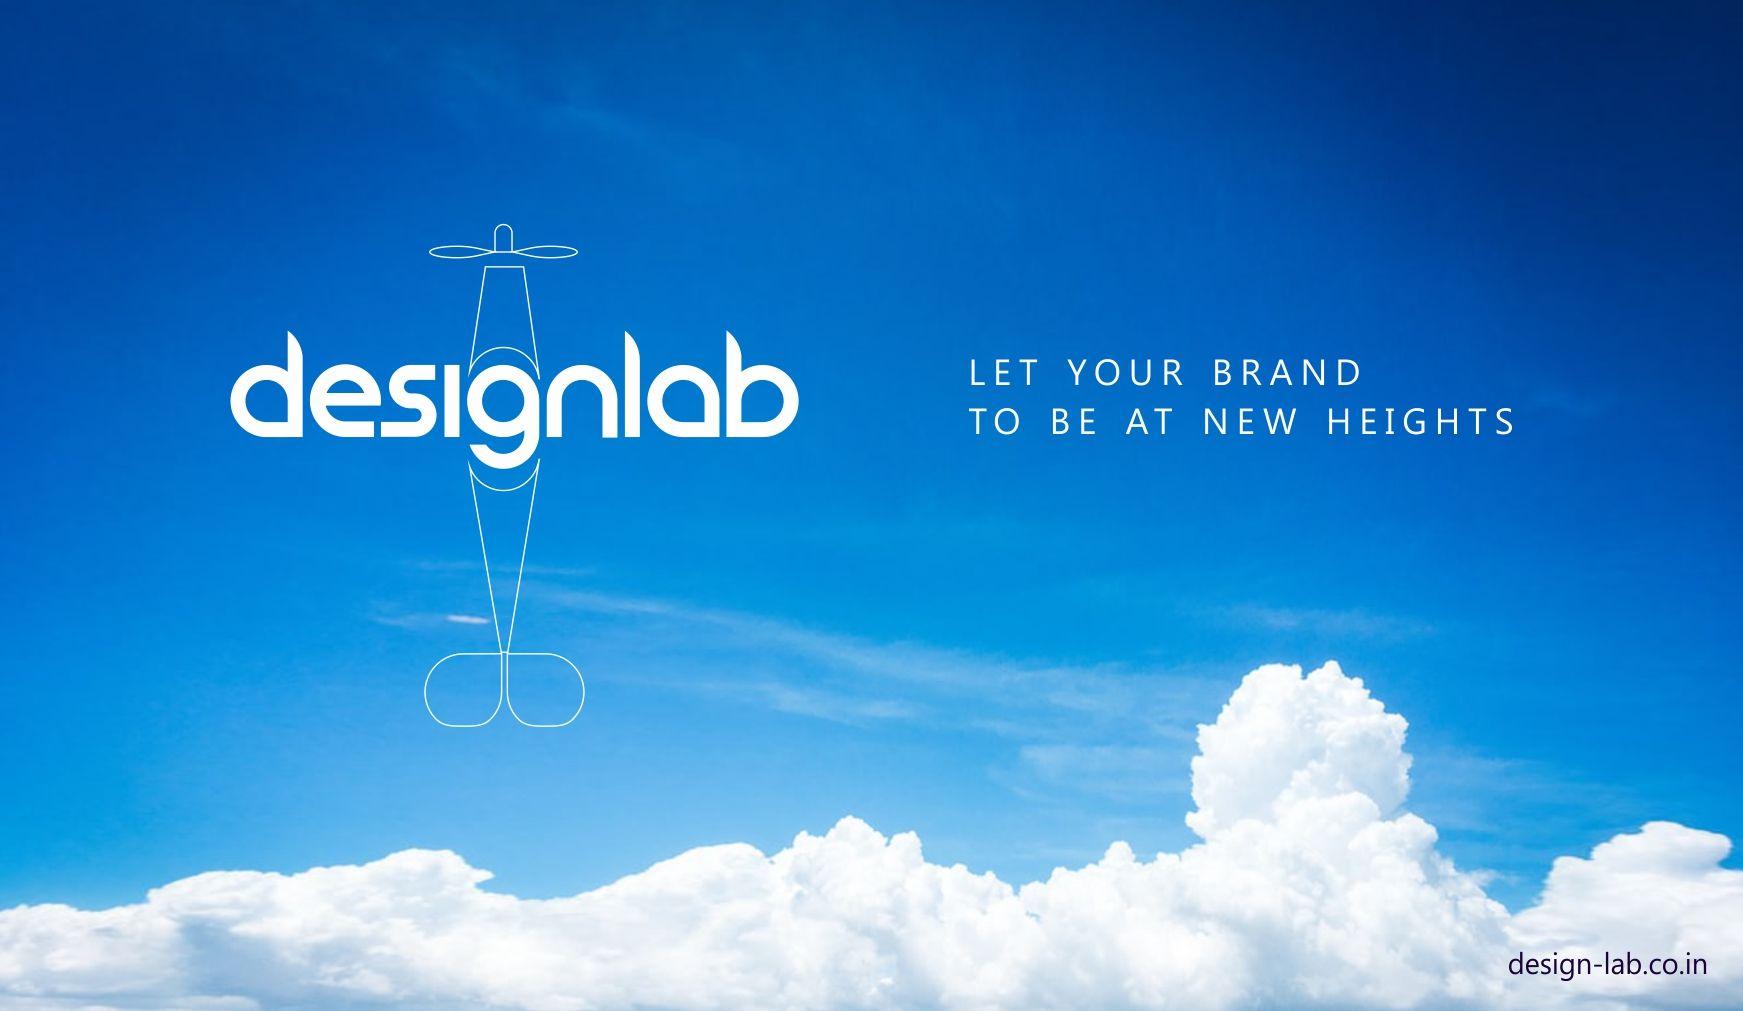 #branding #brandinglogo #logobranding #branding_design #brandingdesign #brandingagency #brandingpersonal #brandingidentity #brandingmob #brandingexpert #welovebranding #brandingtips #design #instadesign #designlogo #designer #logodesign